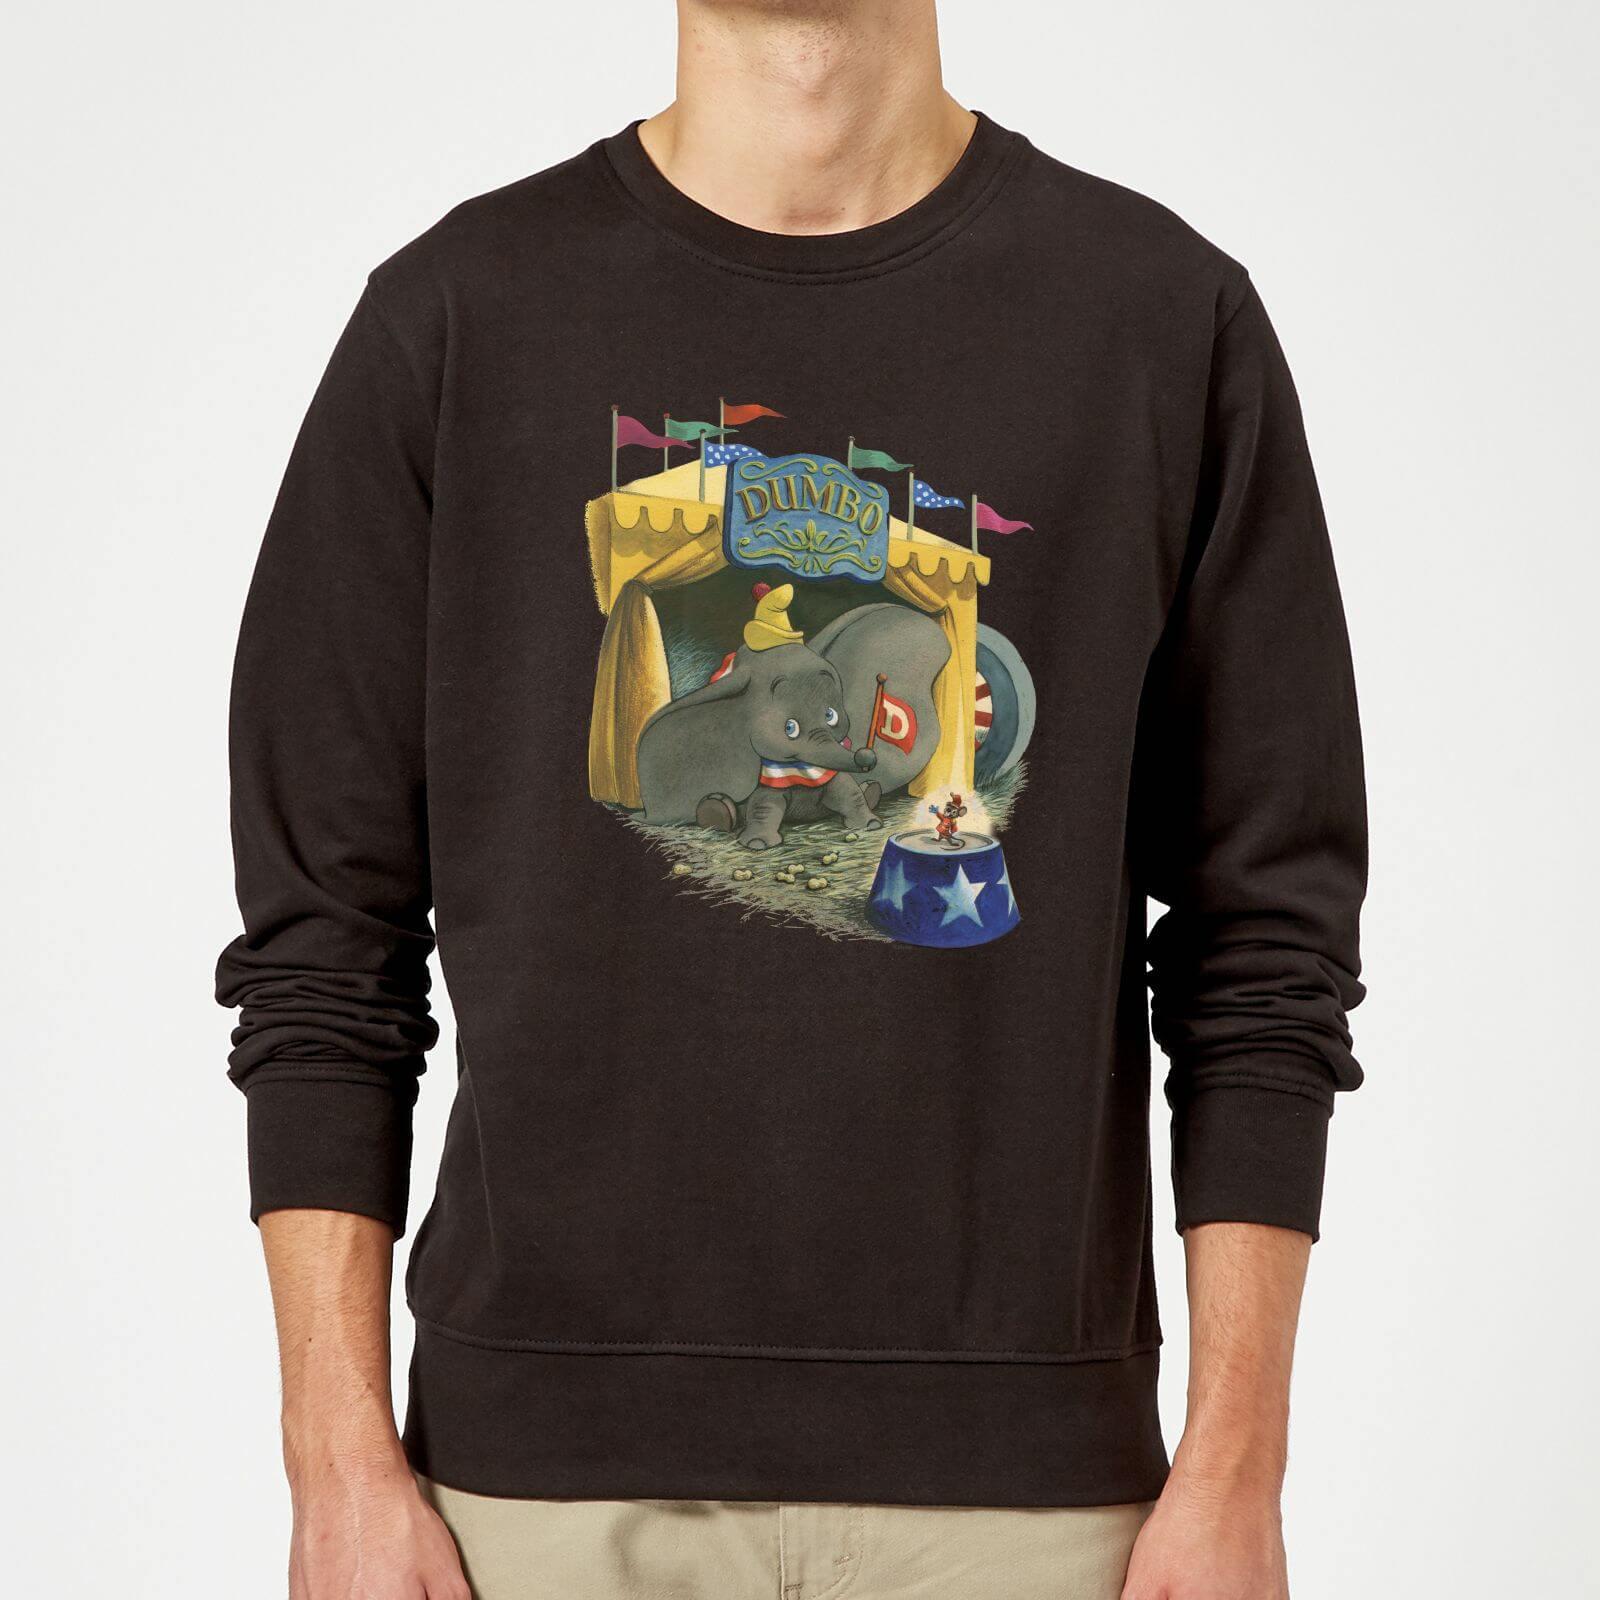 Disney Dumbo Circus Sweatshirt - Black - 5XL - Black